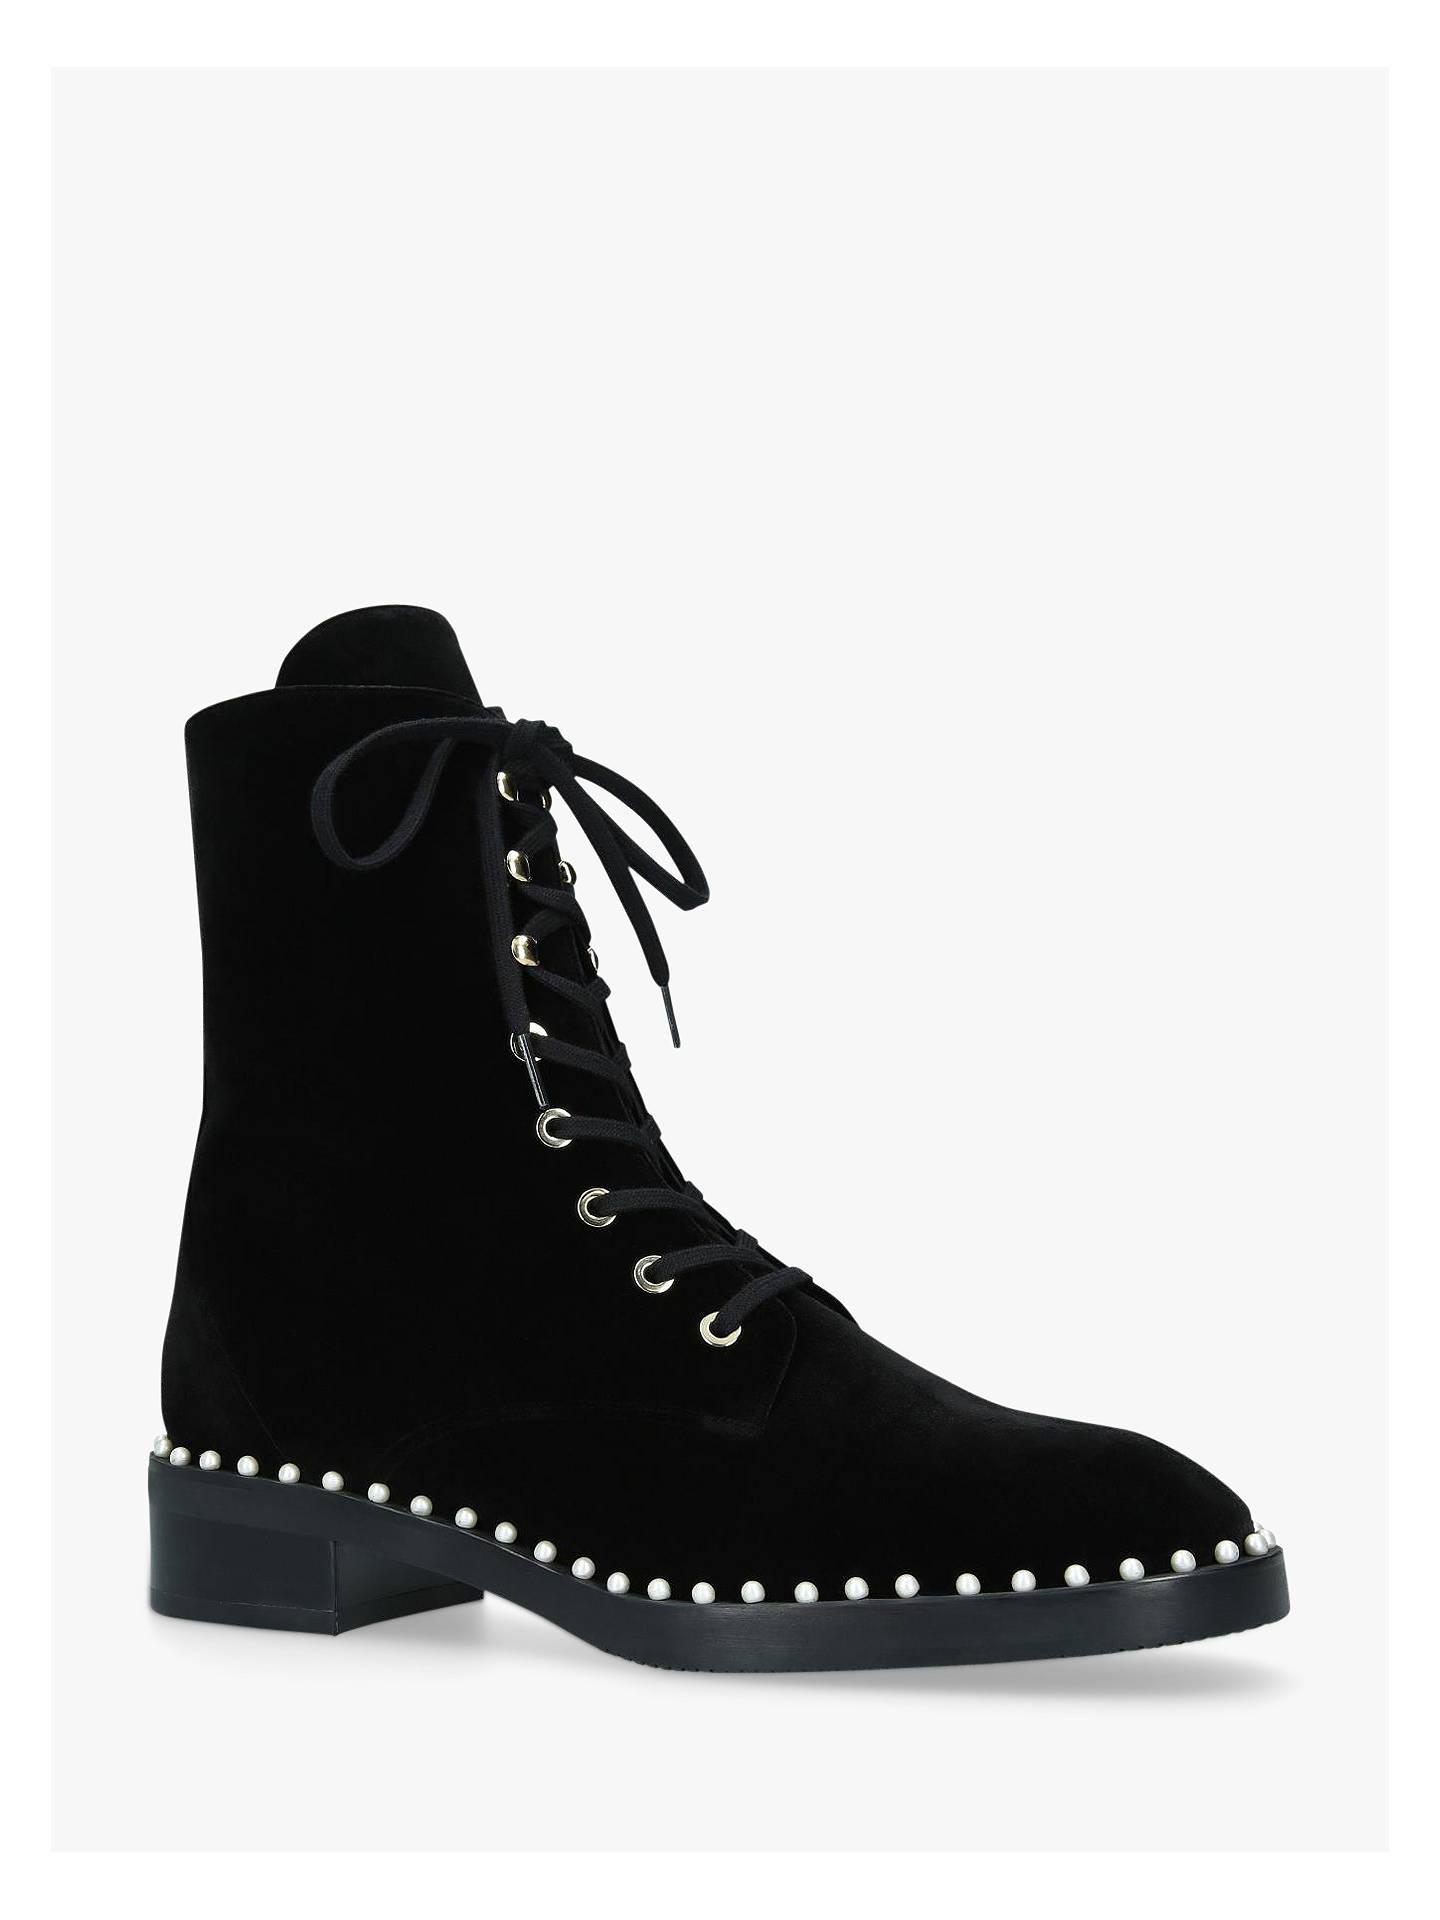 4c2140f0ffc Stuart Weitzman Sondra Combat Leather Lace Up Ankle Boots, Black